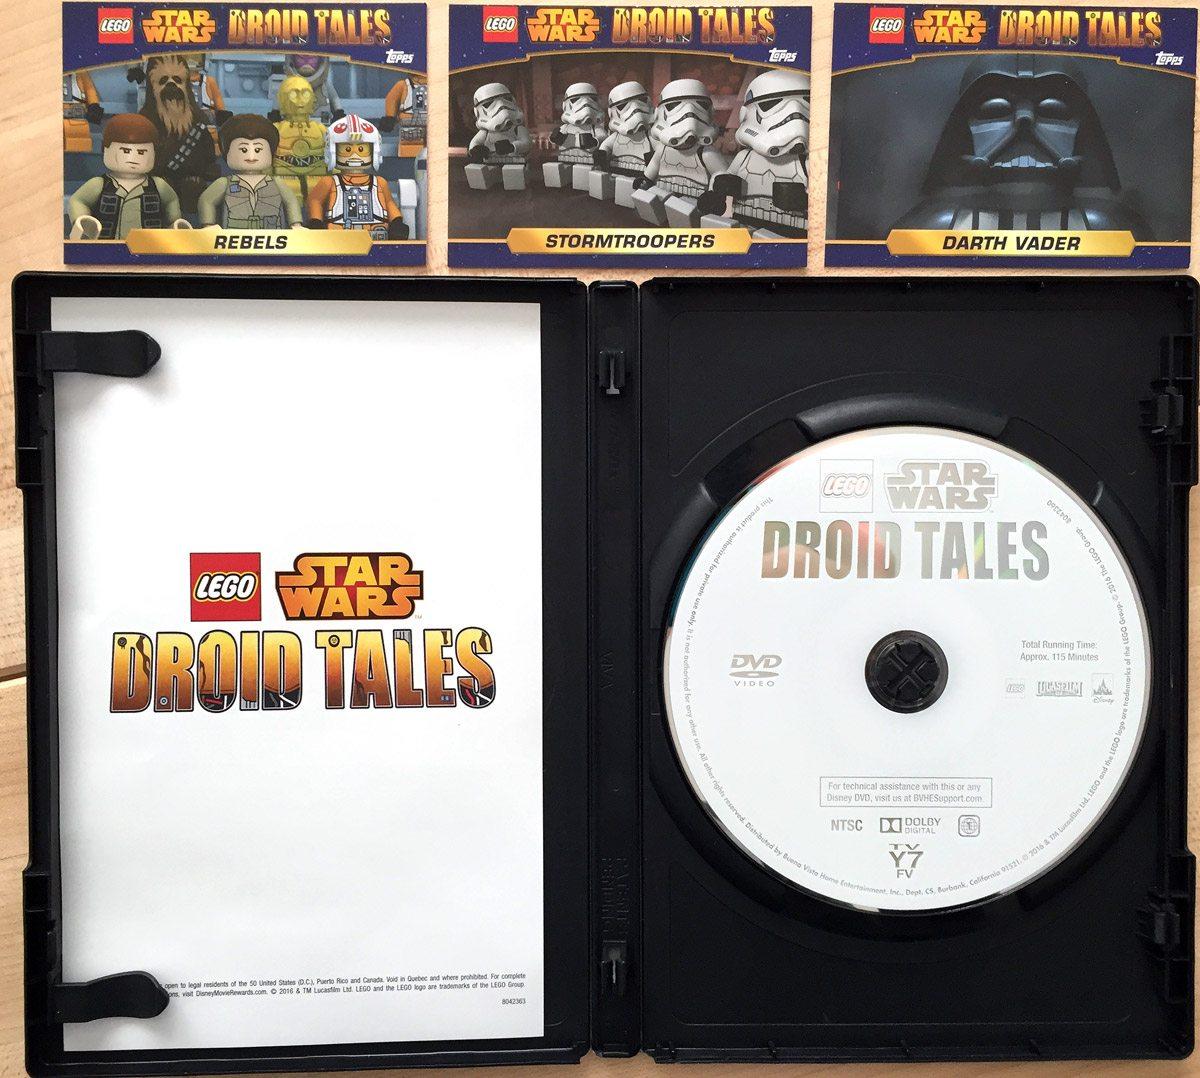 LegoStarWarsDroidTales-Contents